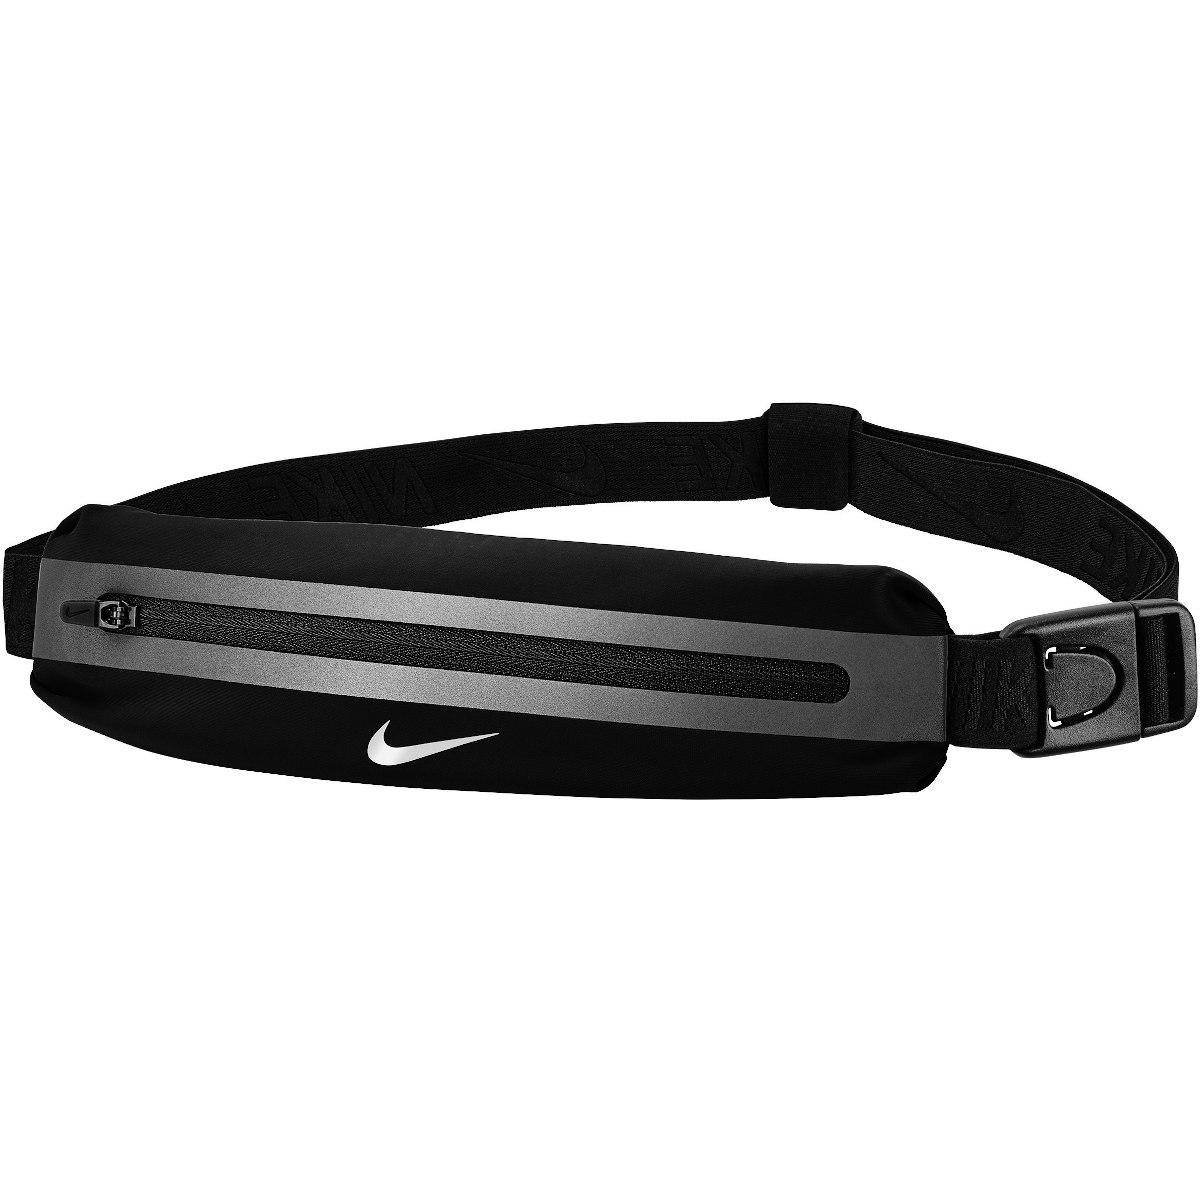 Foto de Nike Slim Waistpack 2.0 Riñonera - black/black/silver 082